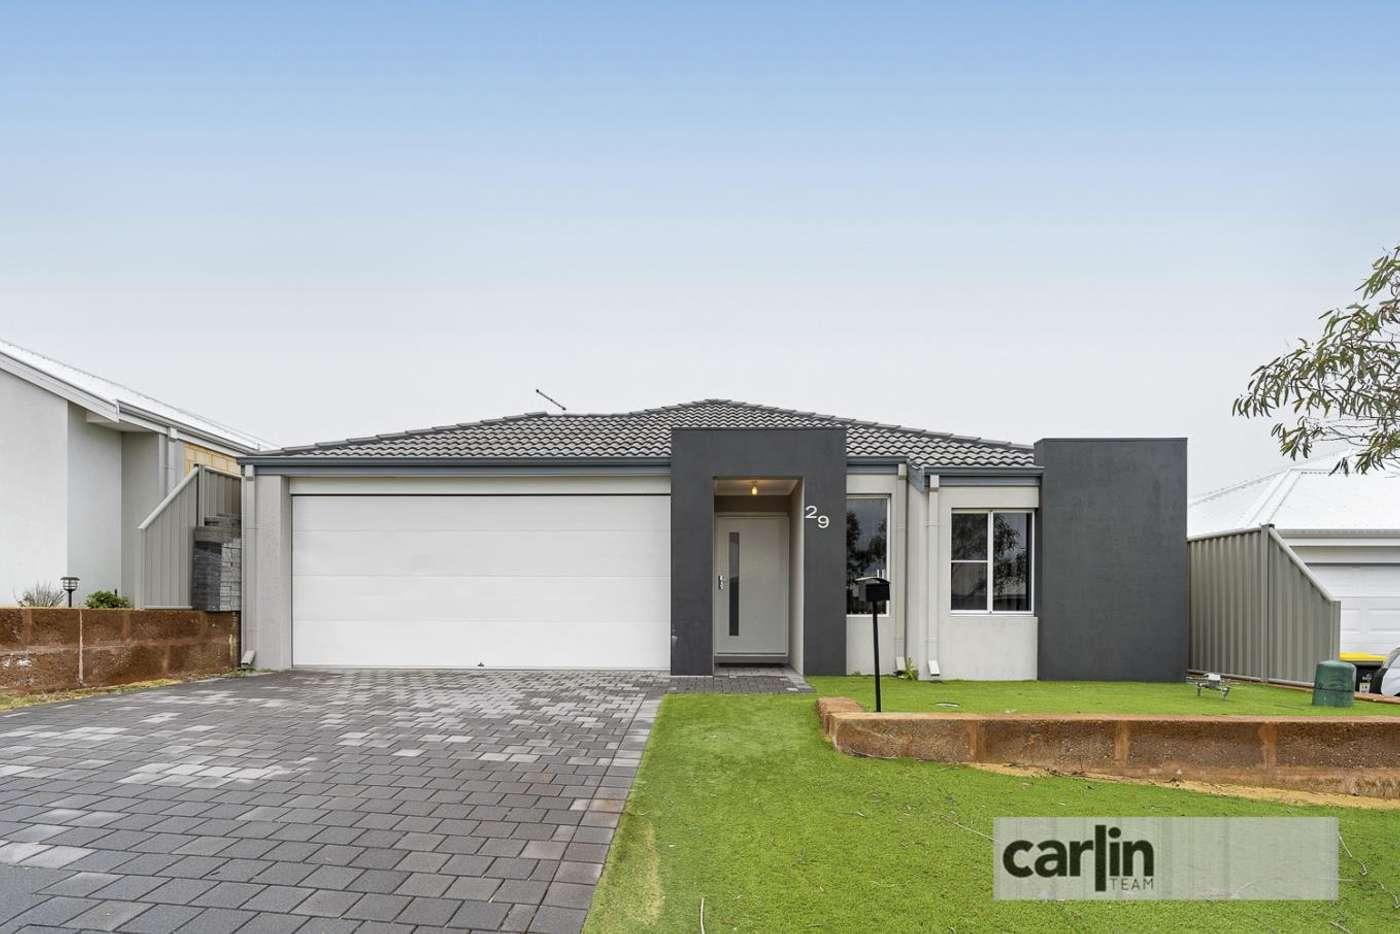 Main view of Homely house listing, 29 Tiliqua Crescent, Wandi WA 6167